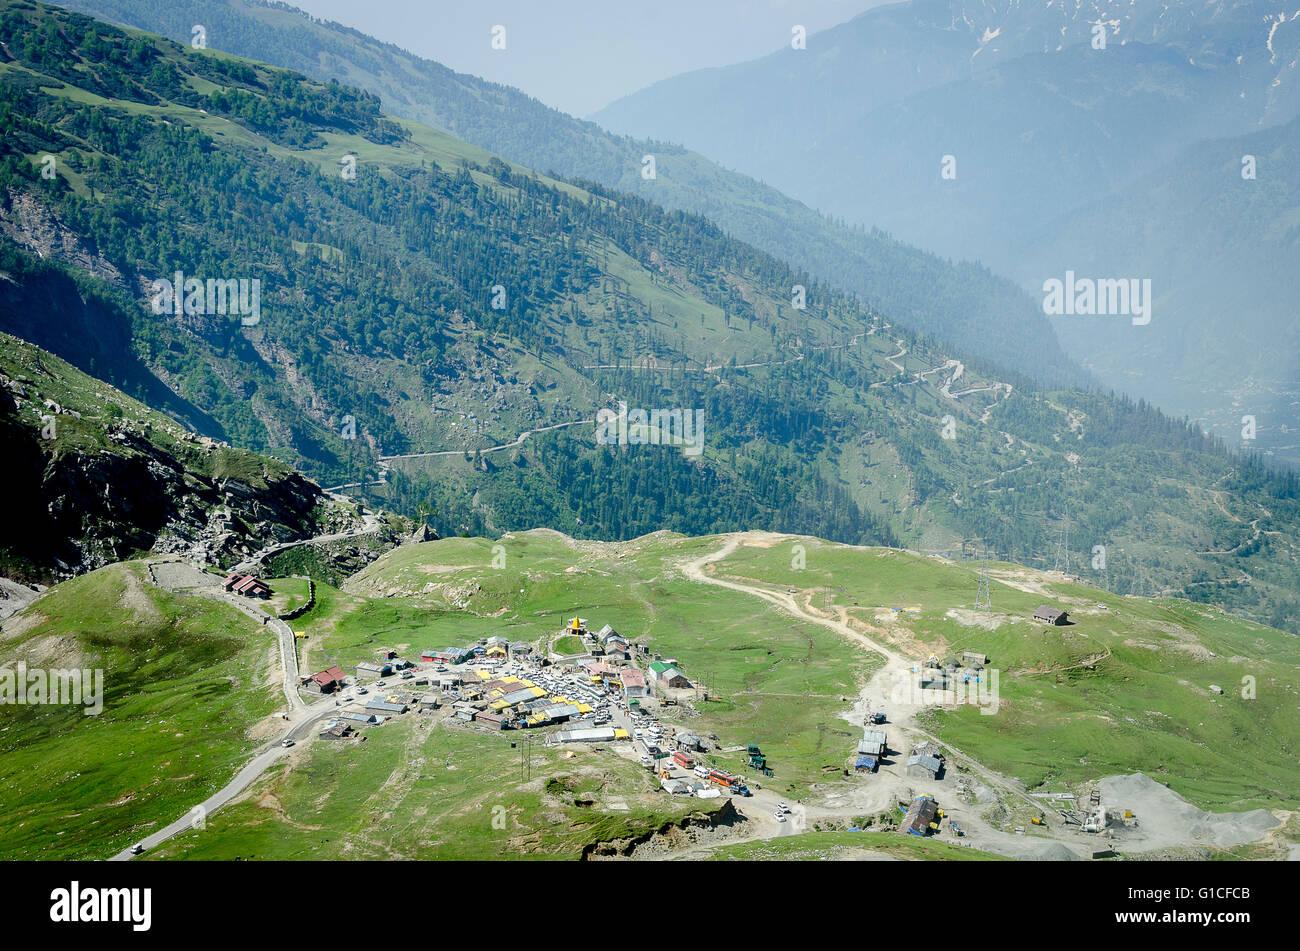 Road to the Rotang Pass from Manali, Manali - Leh Road, Himachal Pradesh, India, - Stock Image